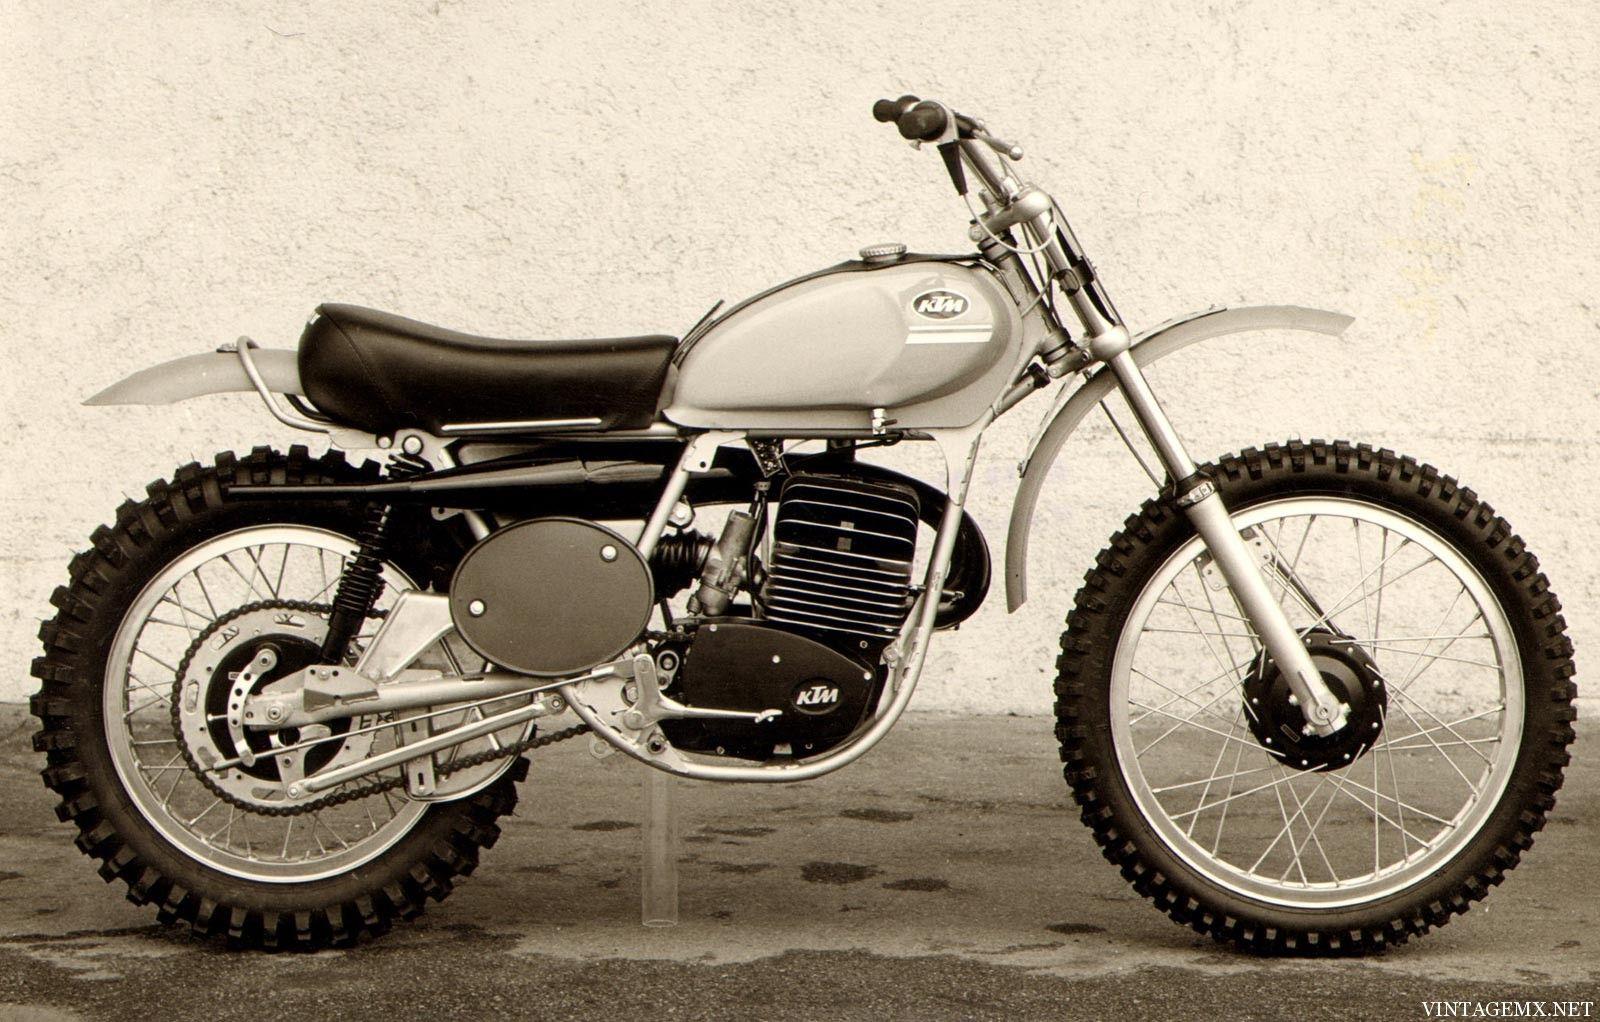 Vintage Ktm Motorcycles Ktm History Information Ktm Ktm Motorcycles Motorcycle